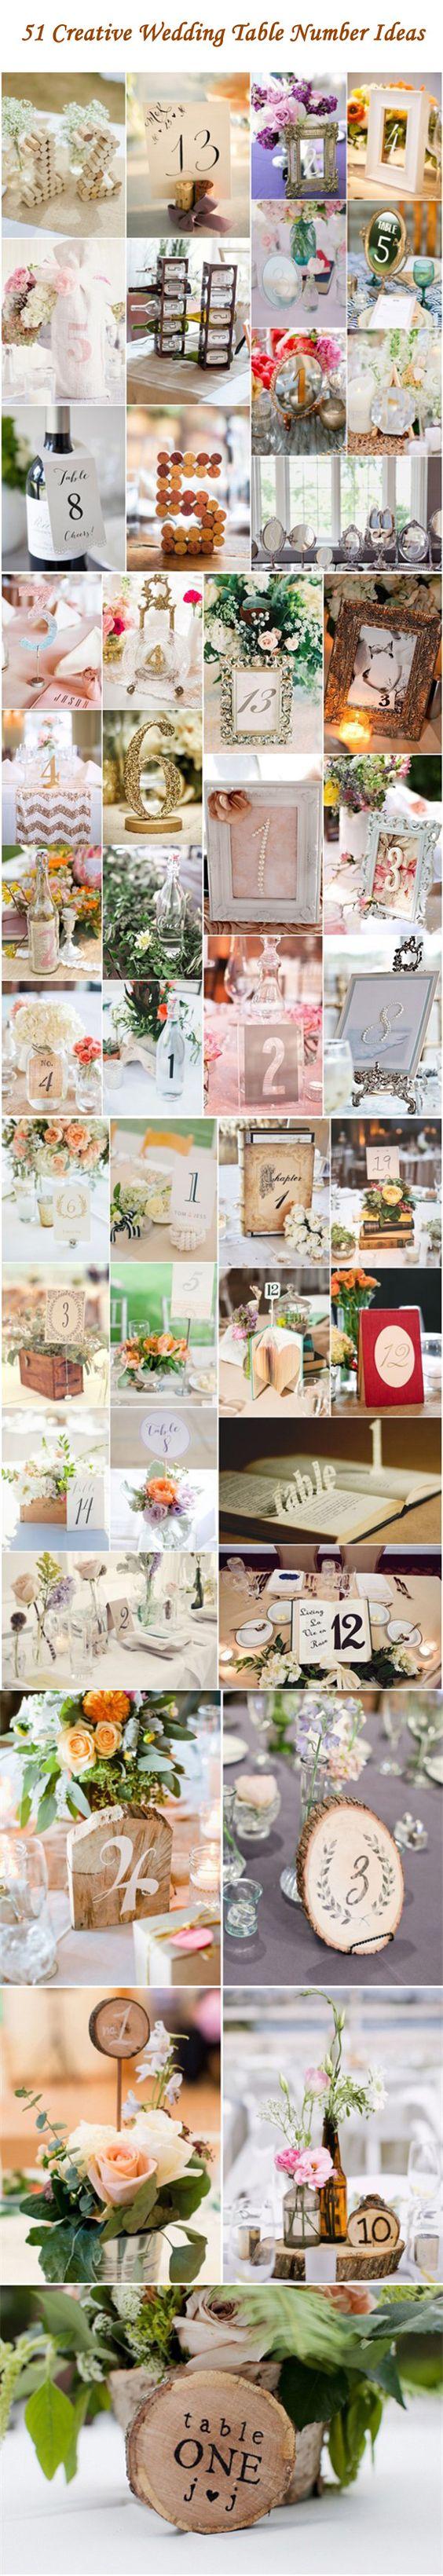 Wedding Decor ideas - 51 Creative DIY Wedding Table Number Ideas http://www.deerpearlflowers.com/51-creative-diy-wedding-table-number-ideas/